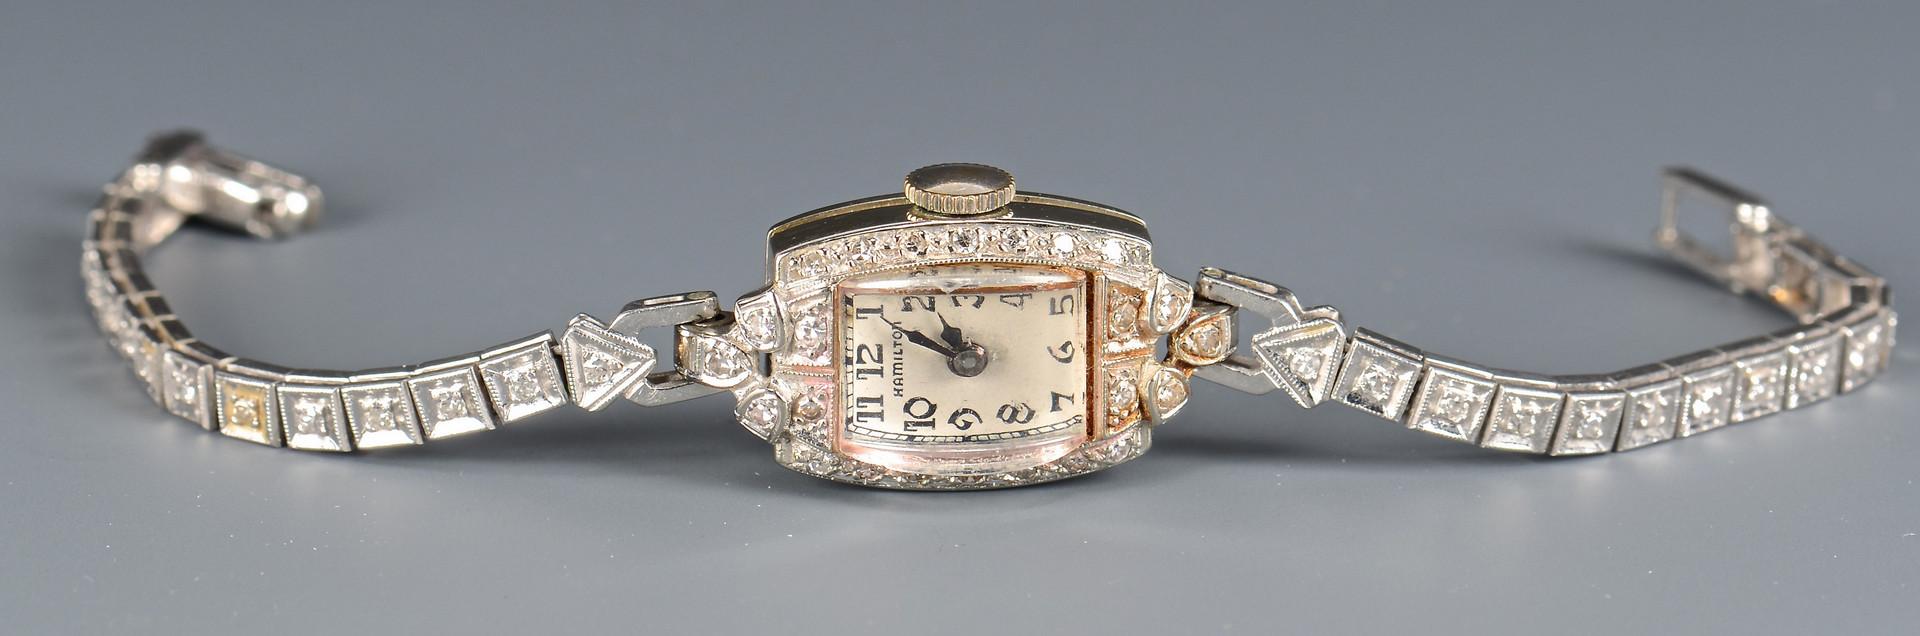 Lot 587: Hamilton Diamond Wristwatch